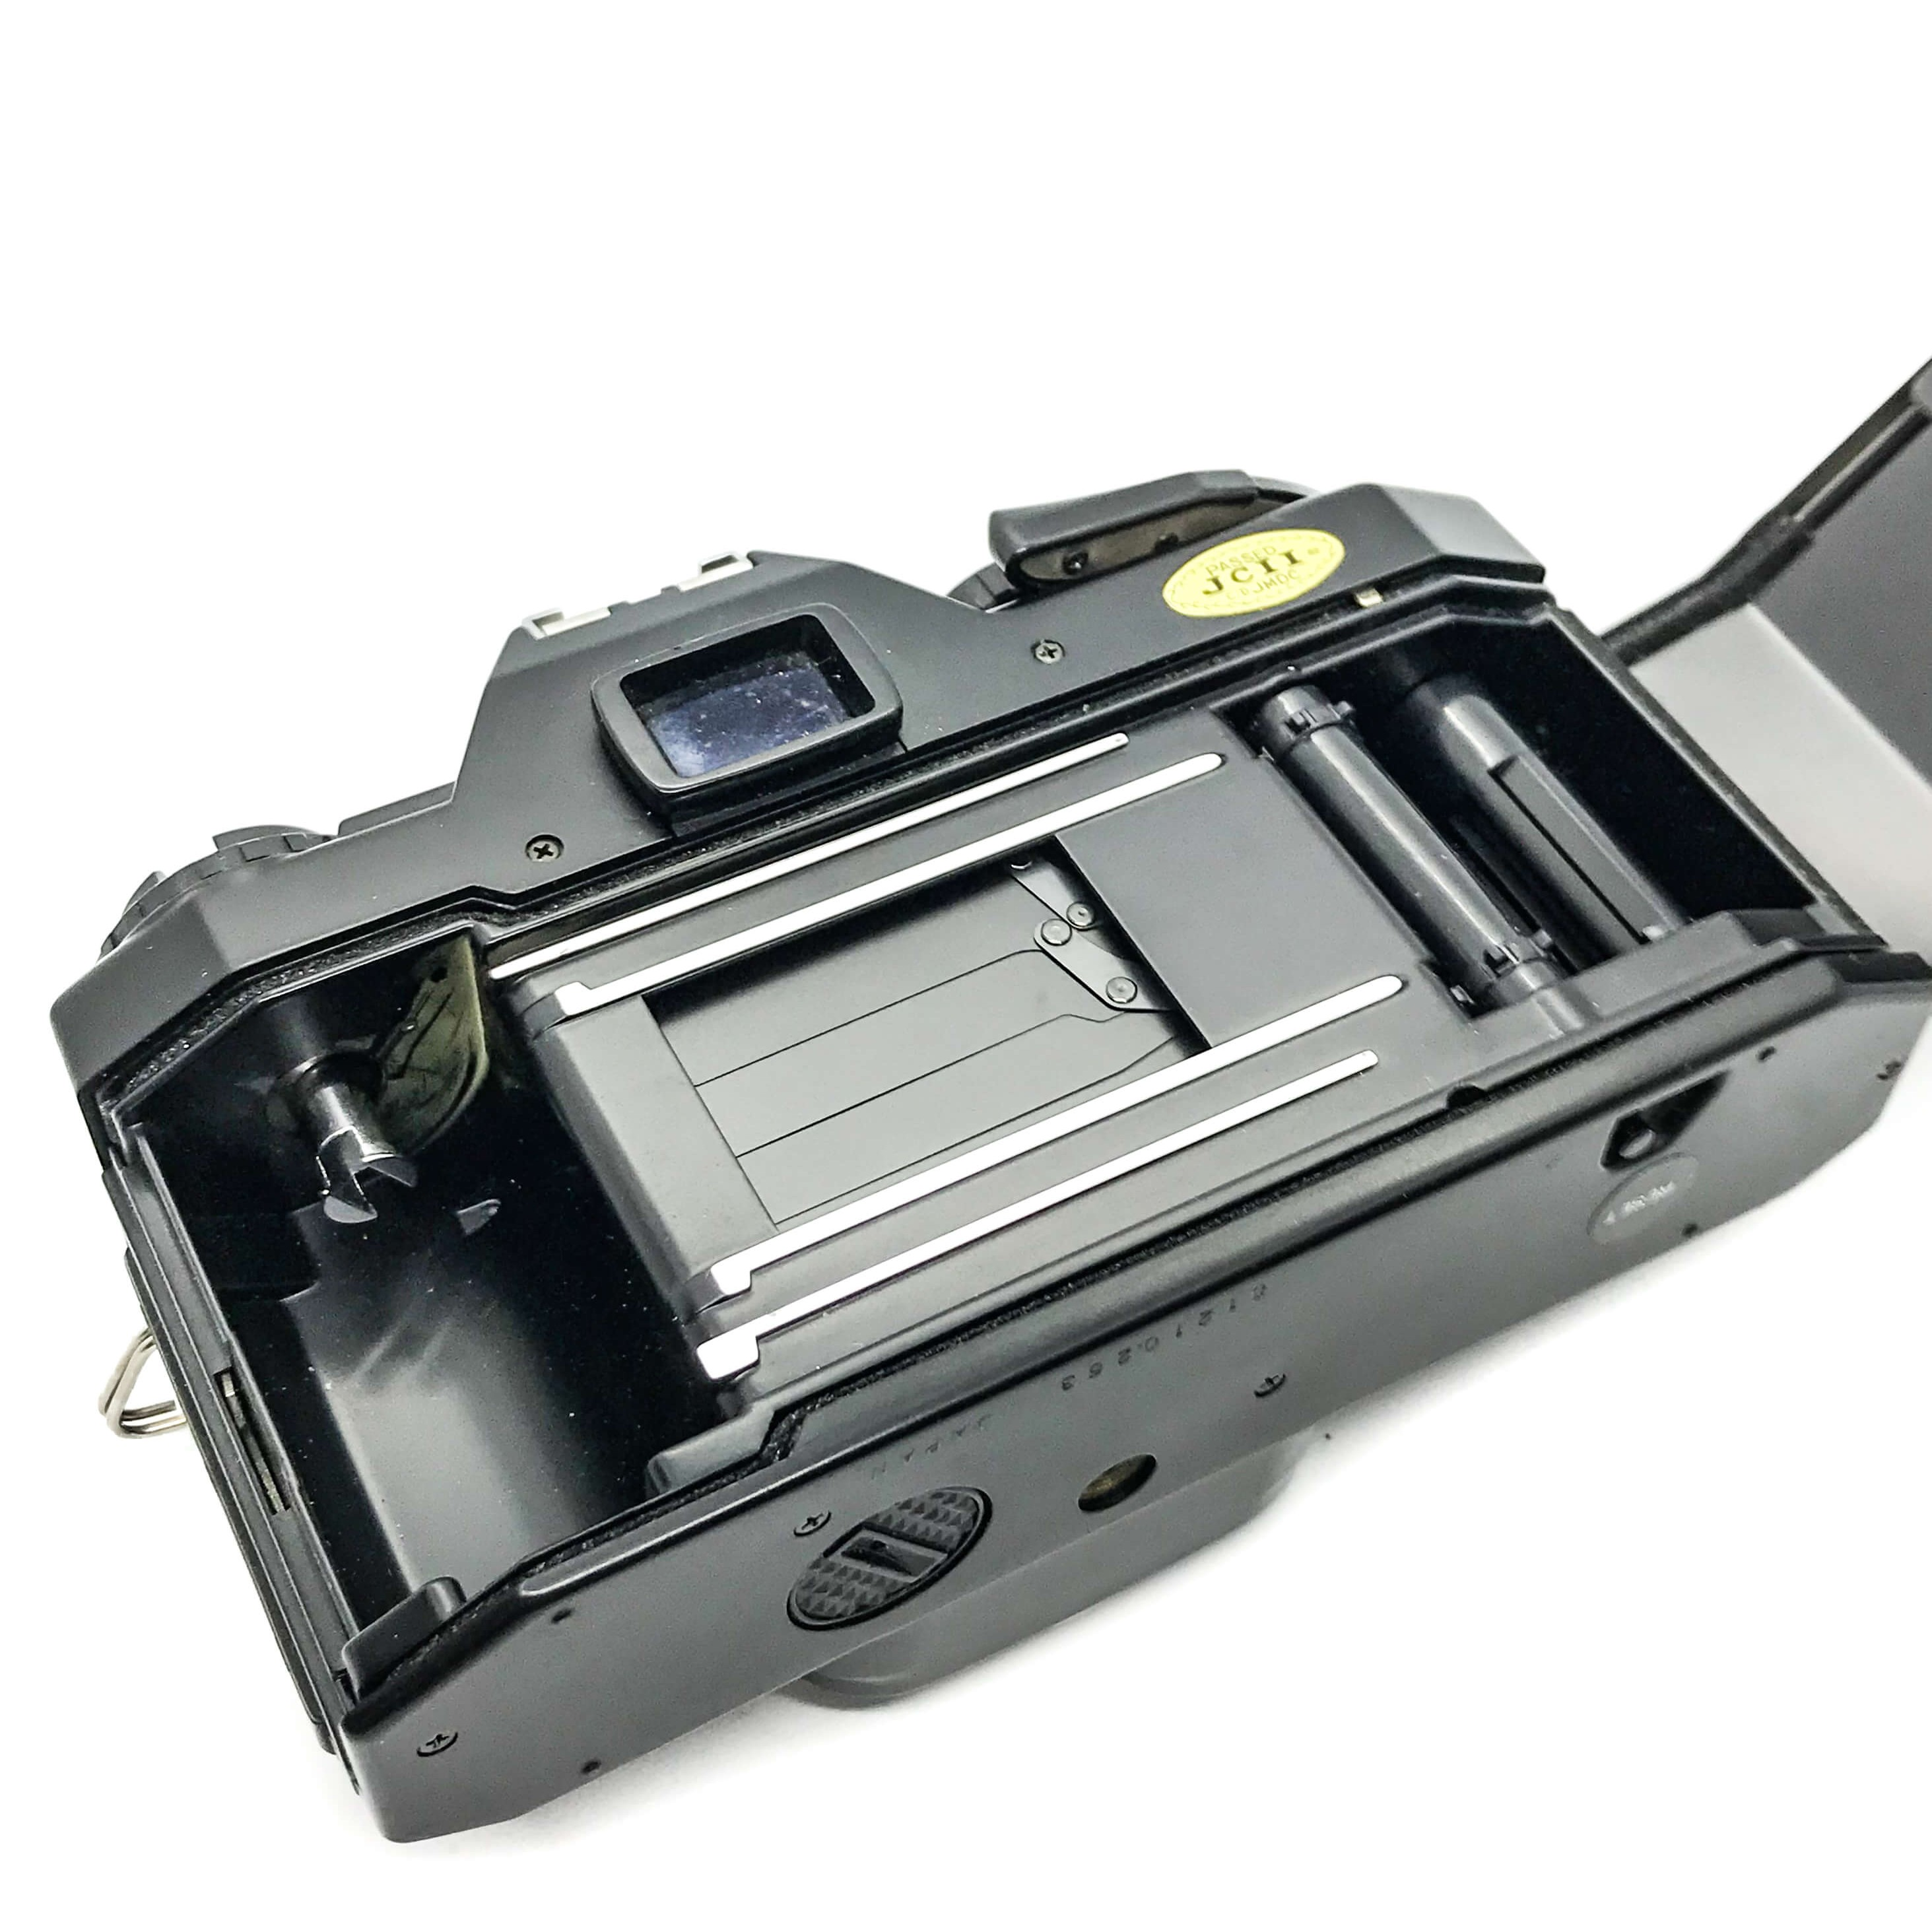 Vivitar v635 film camera on white background vintage